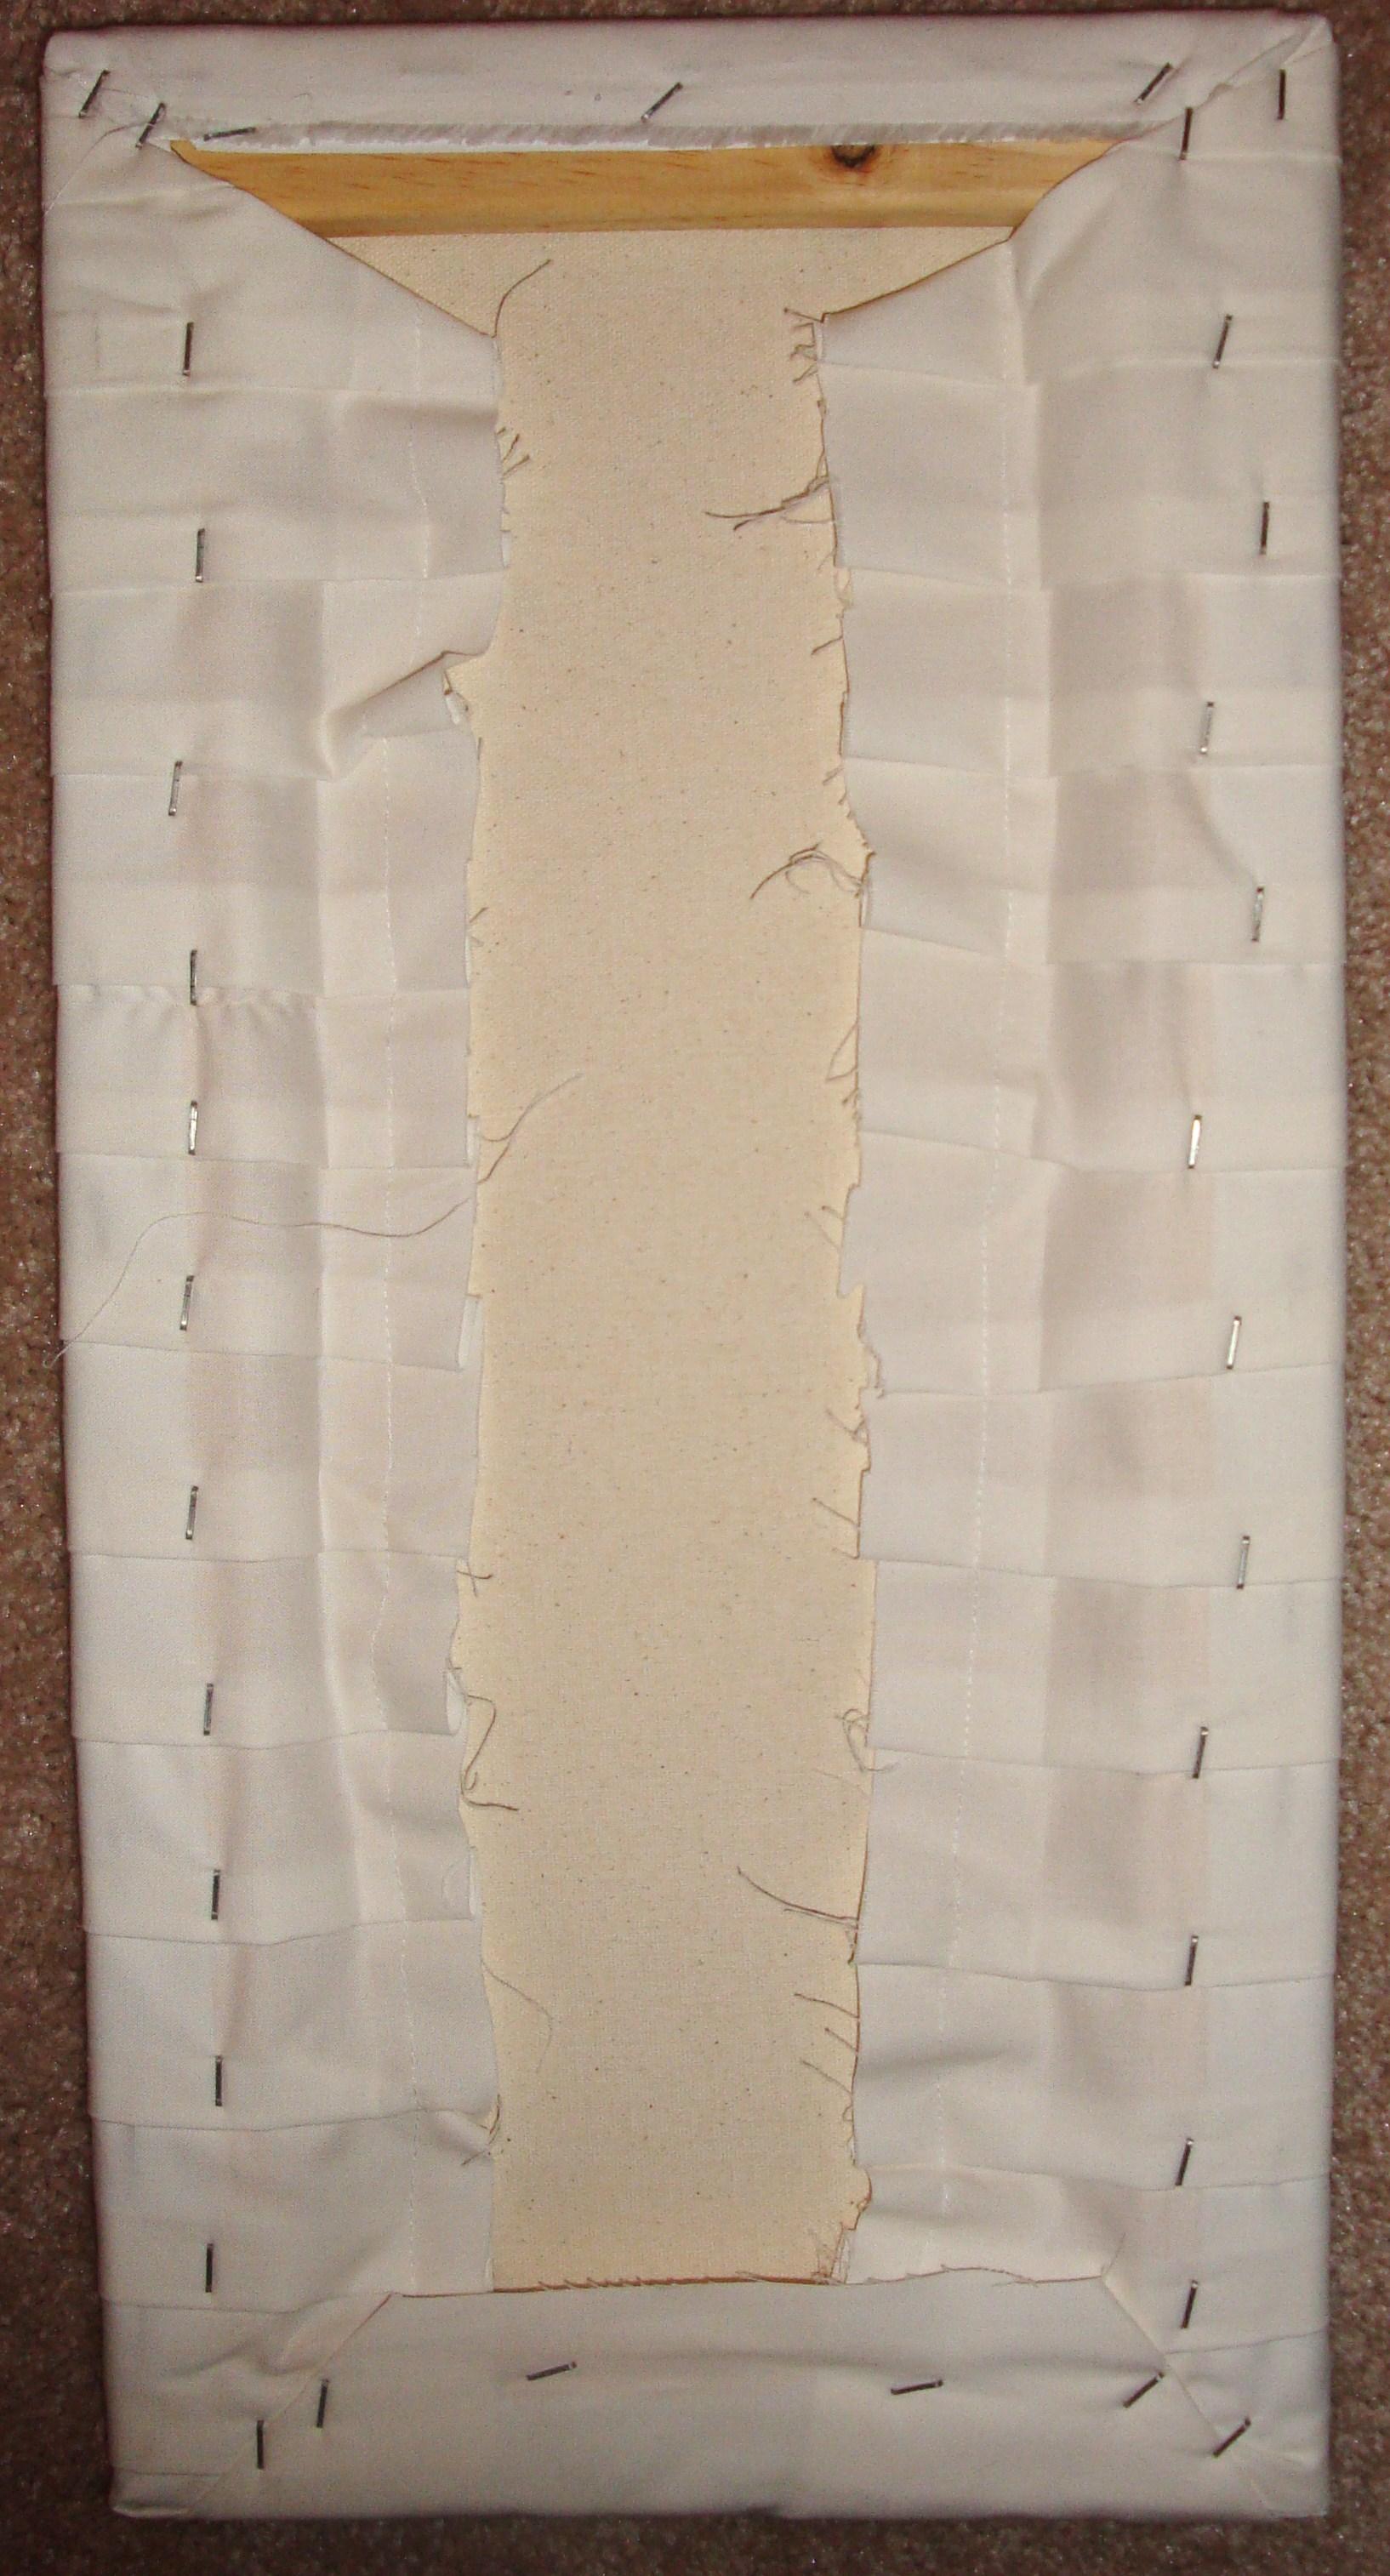 sherwin williams wallpaper easy change 2048 x 1536 jpeg 671kb sherwin 1634x3028